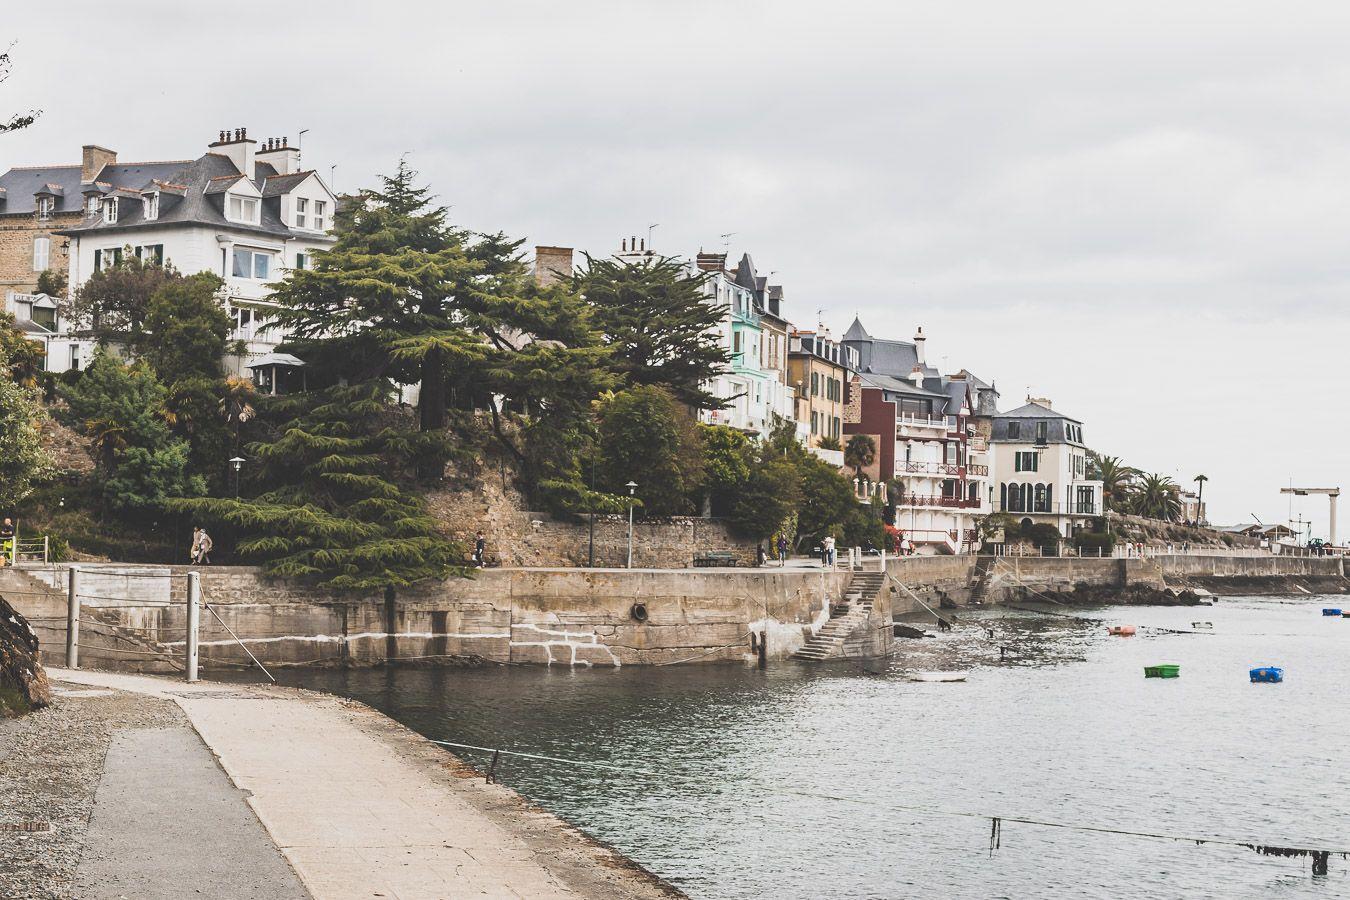 Promenade du Clair de Lune à Dinard